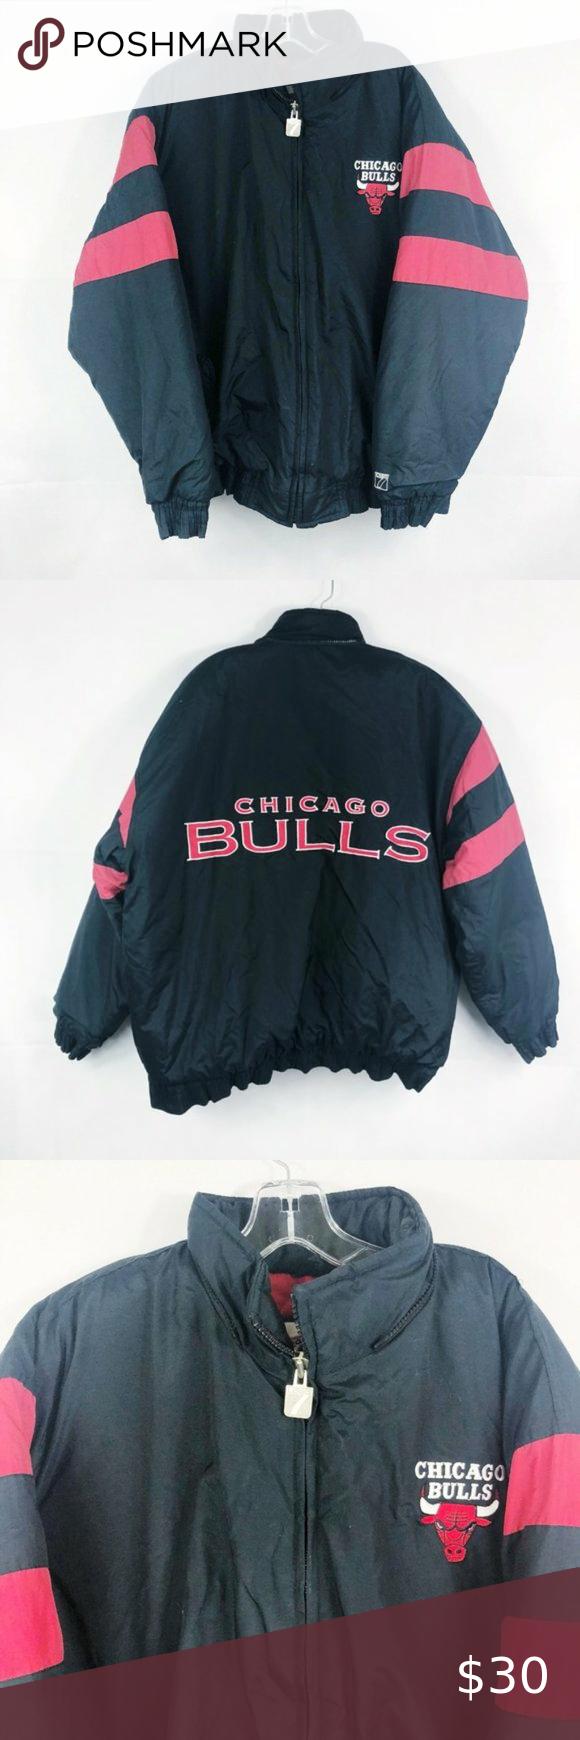 Pin On 1990s Fashion